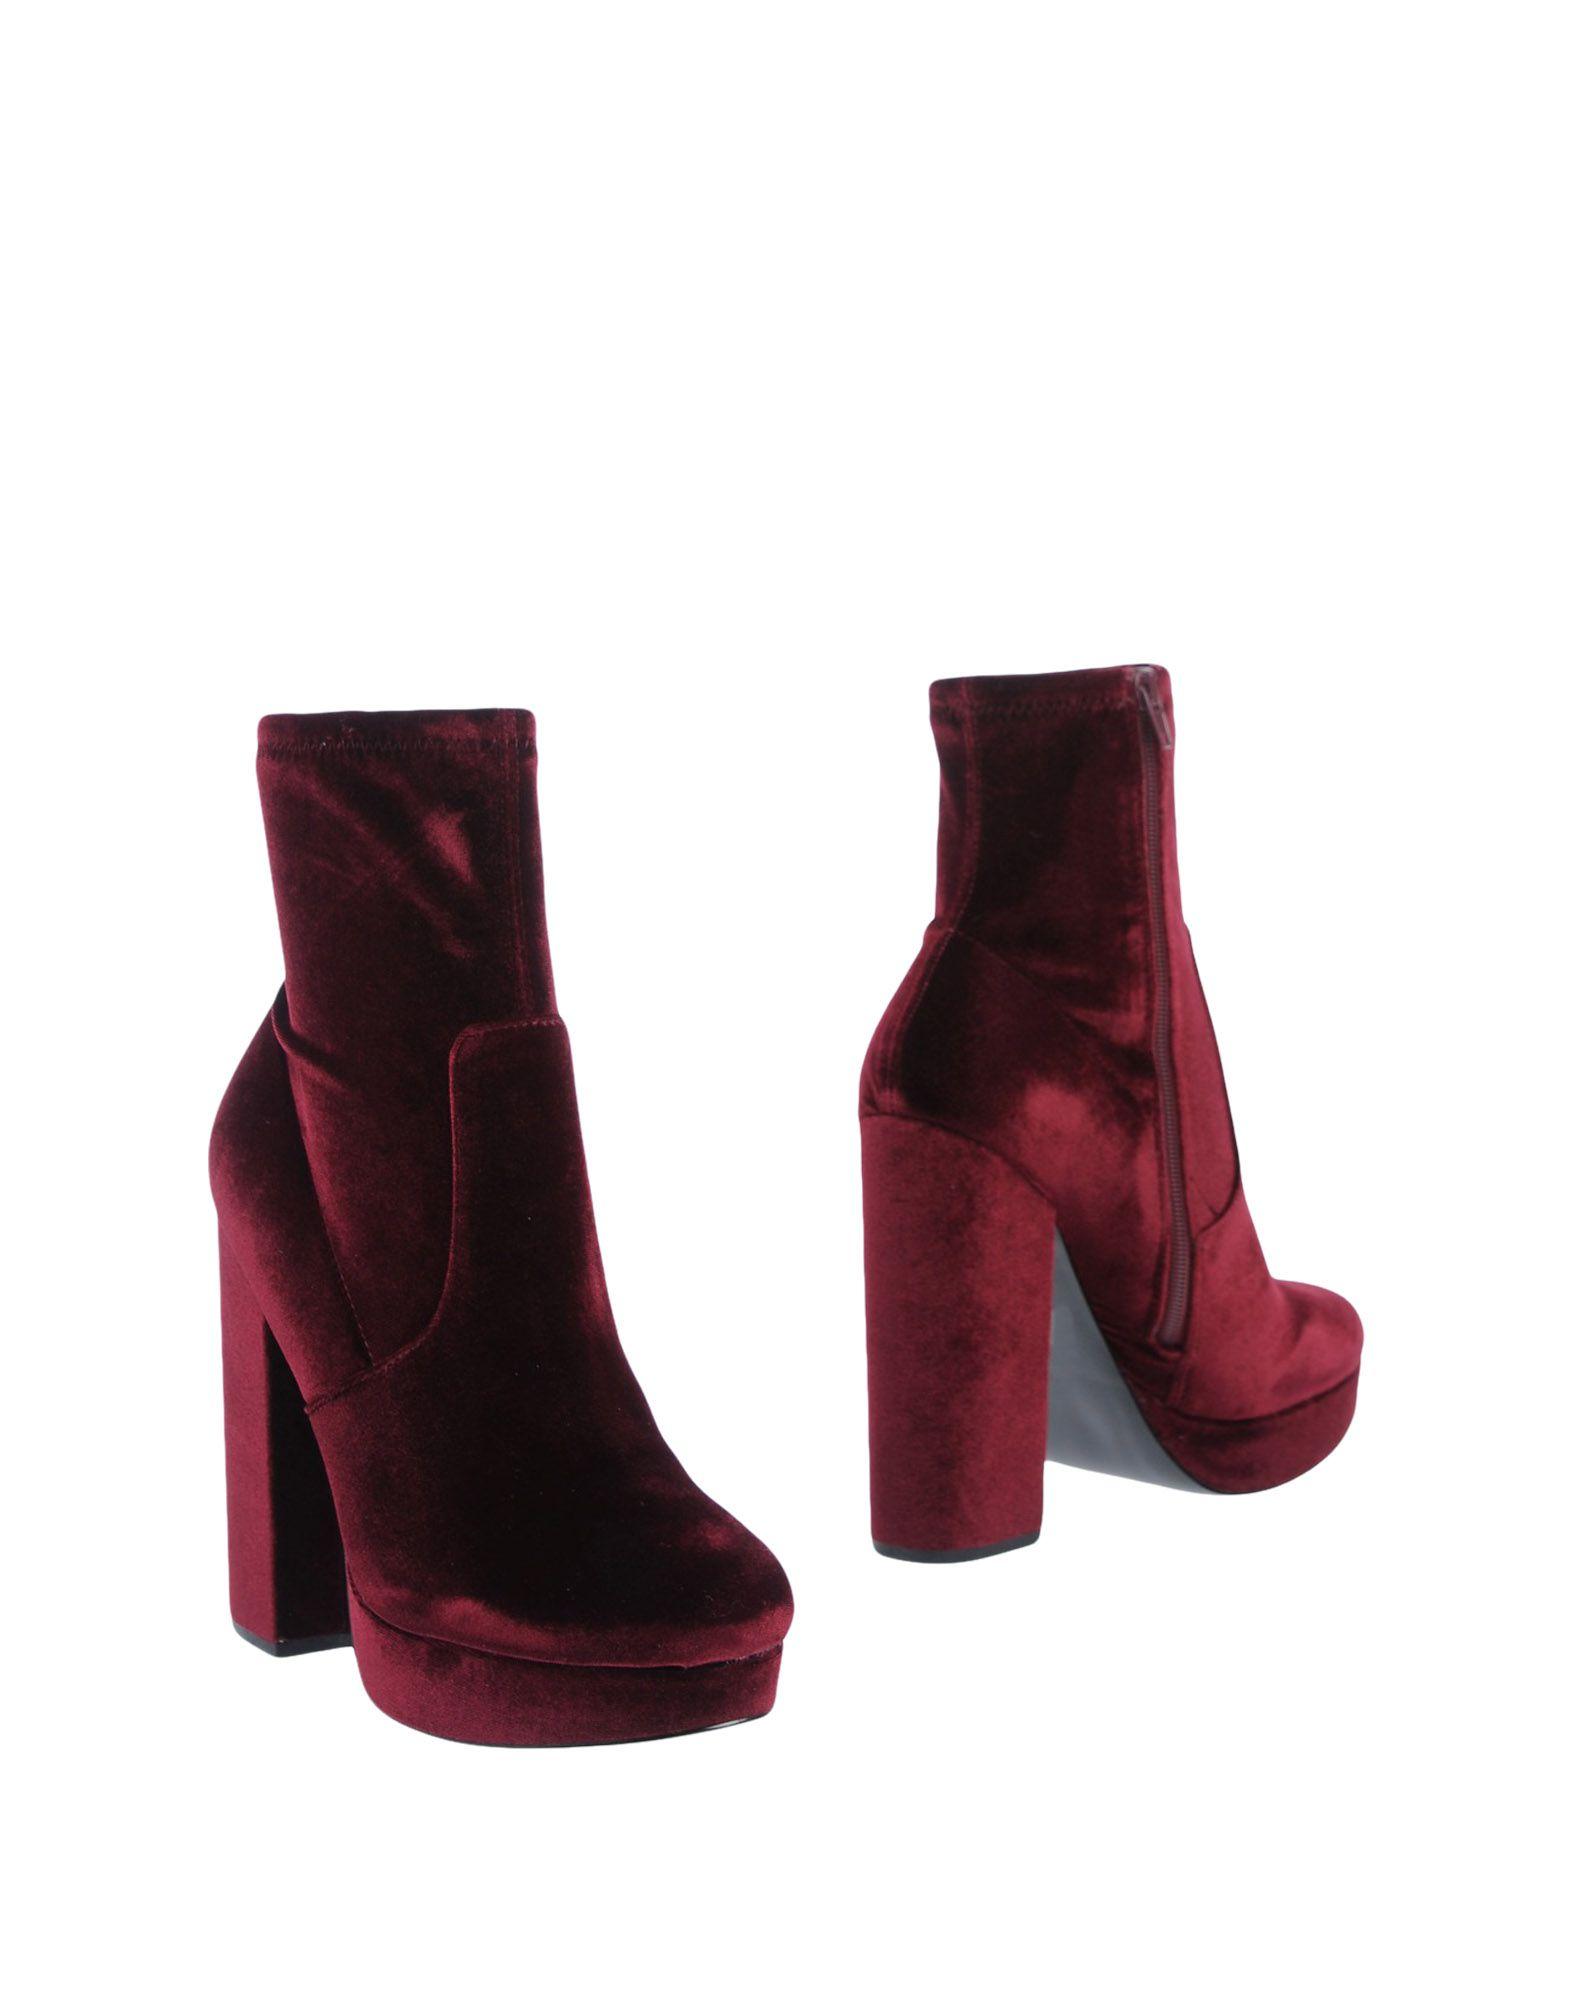 STEVE MADDEN Полусапоги и высокие ботинки steve madden полусапоги и высокие ботинки